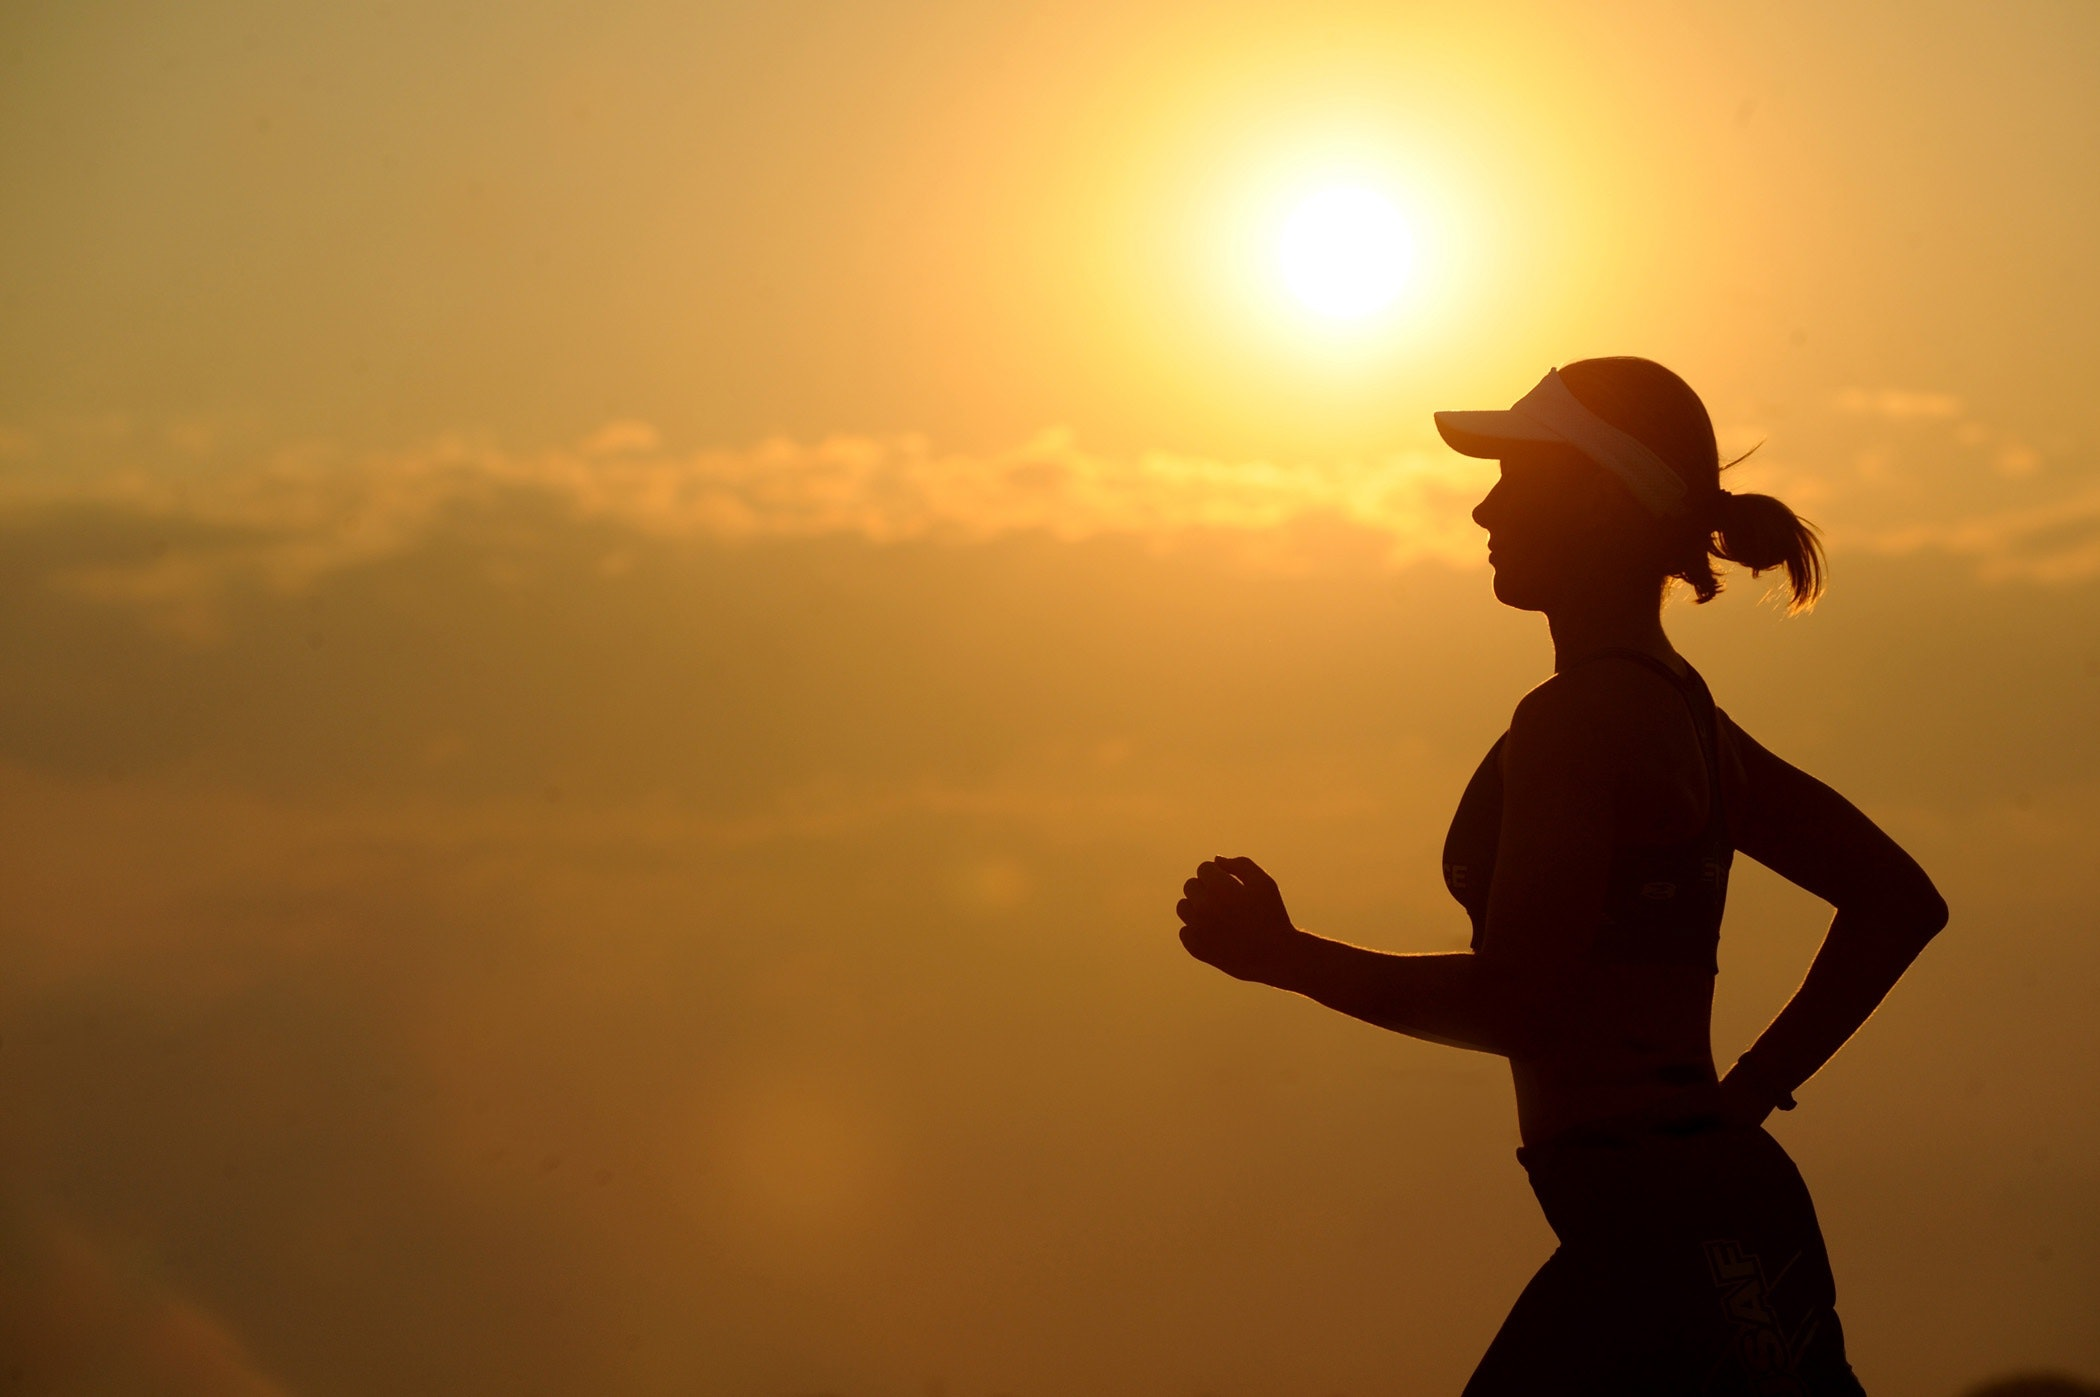 endurance-exercise-female CC0 License via Pexels com